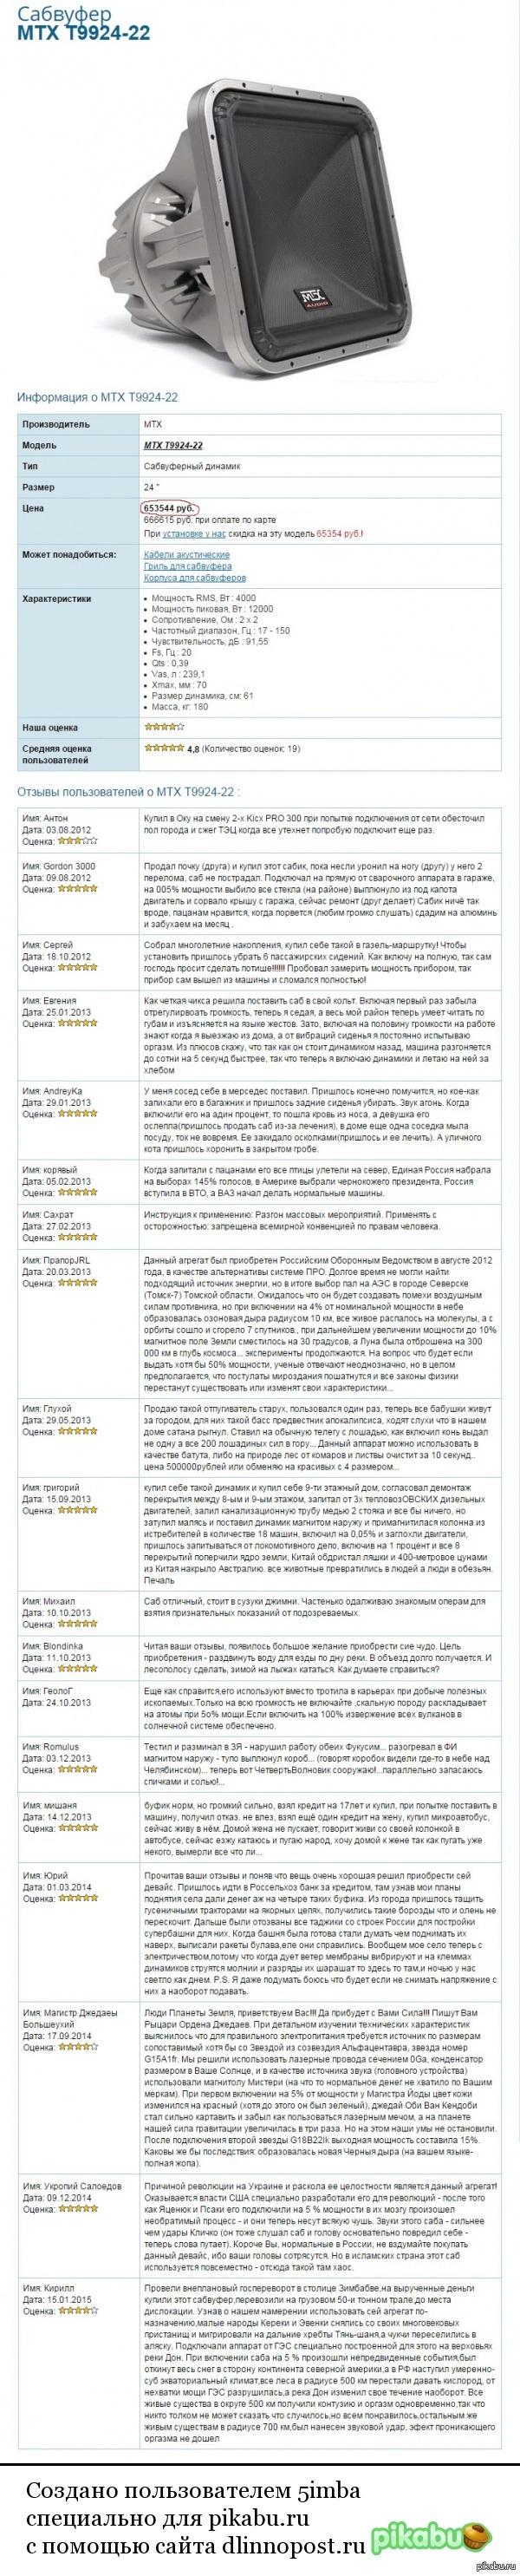 "Отзывы в одном интернет-магазине Прошу прощения, если баян) баянометр молчал. По мотивам поста: <a href=""http://pikabu.ru/story/otzyivyi_v_google_play_zastavlyayut_ulyibnutsya_3185192"">http://pikabu.ru/story/_3185192</a>"